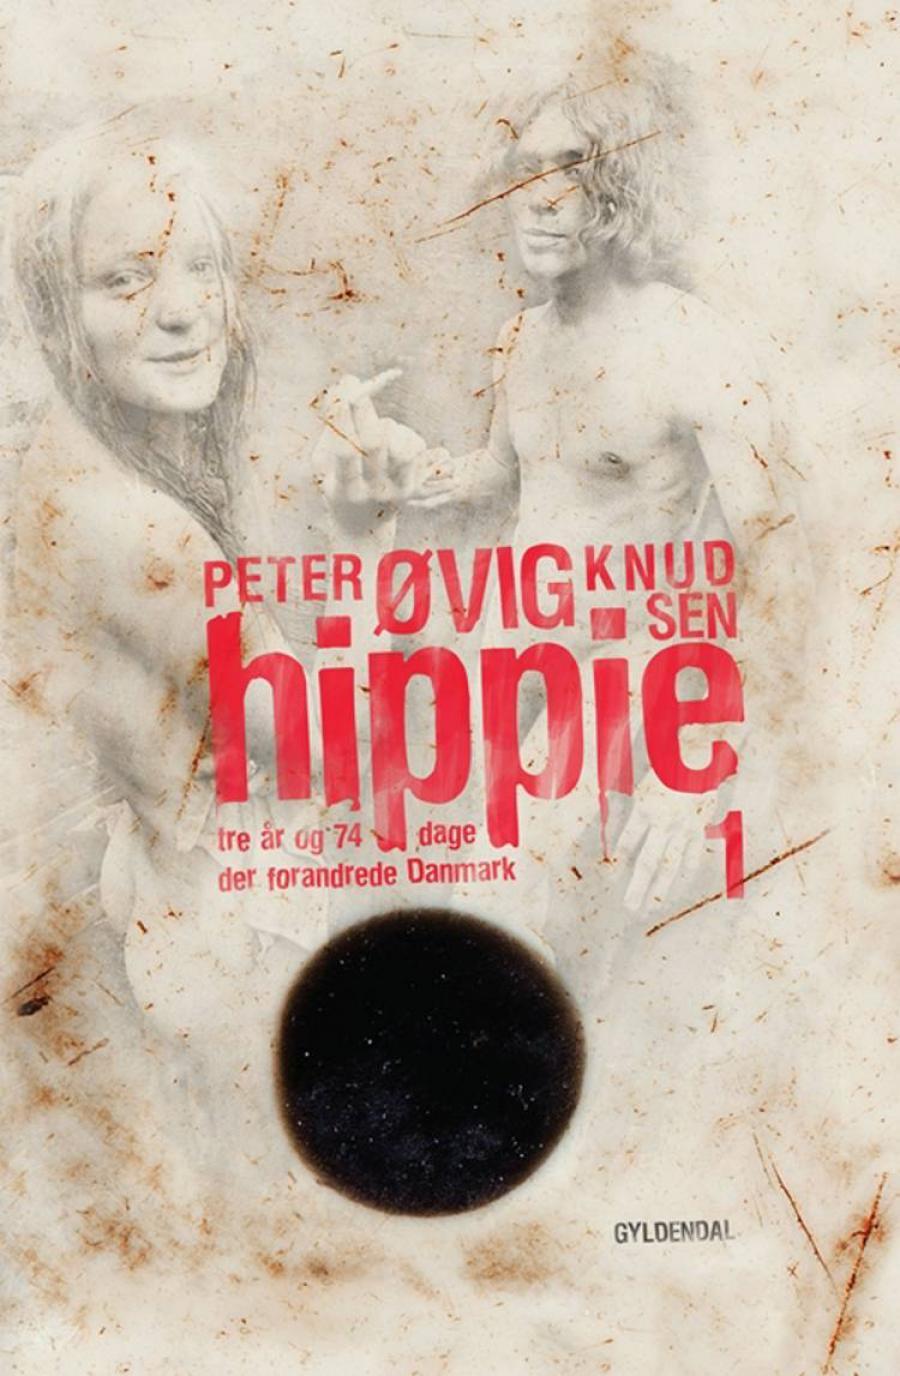 Hippie af Peter Øvig Knudsen